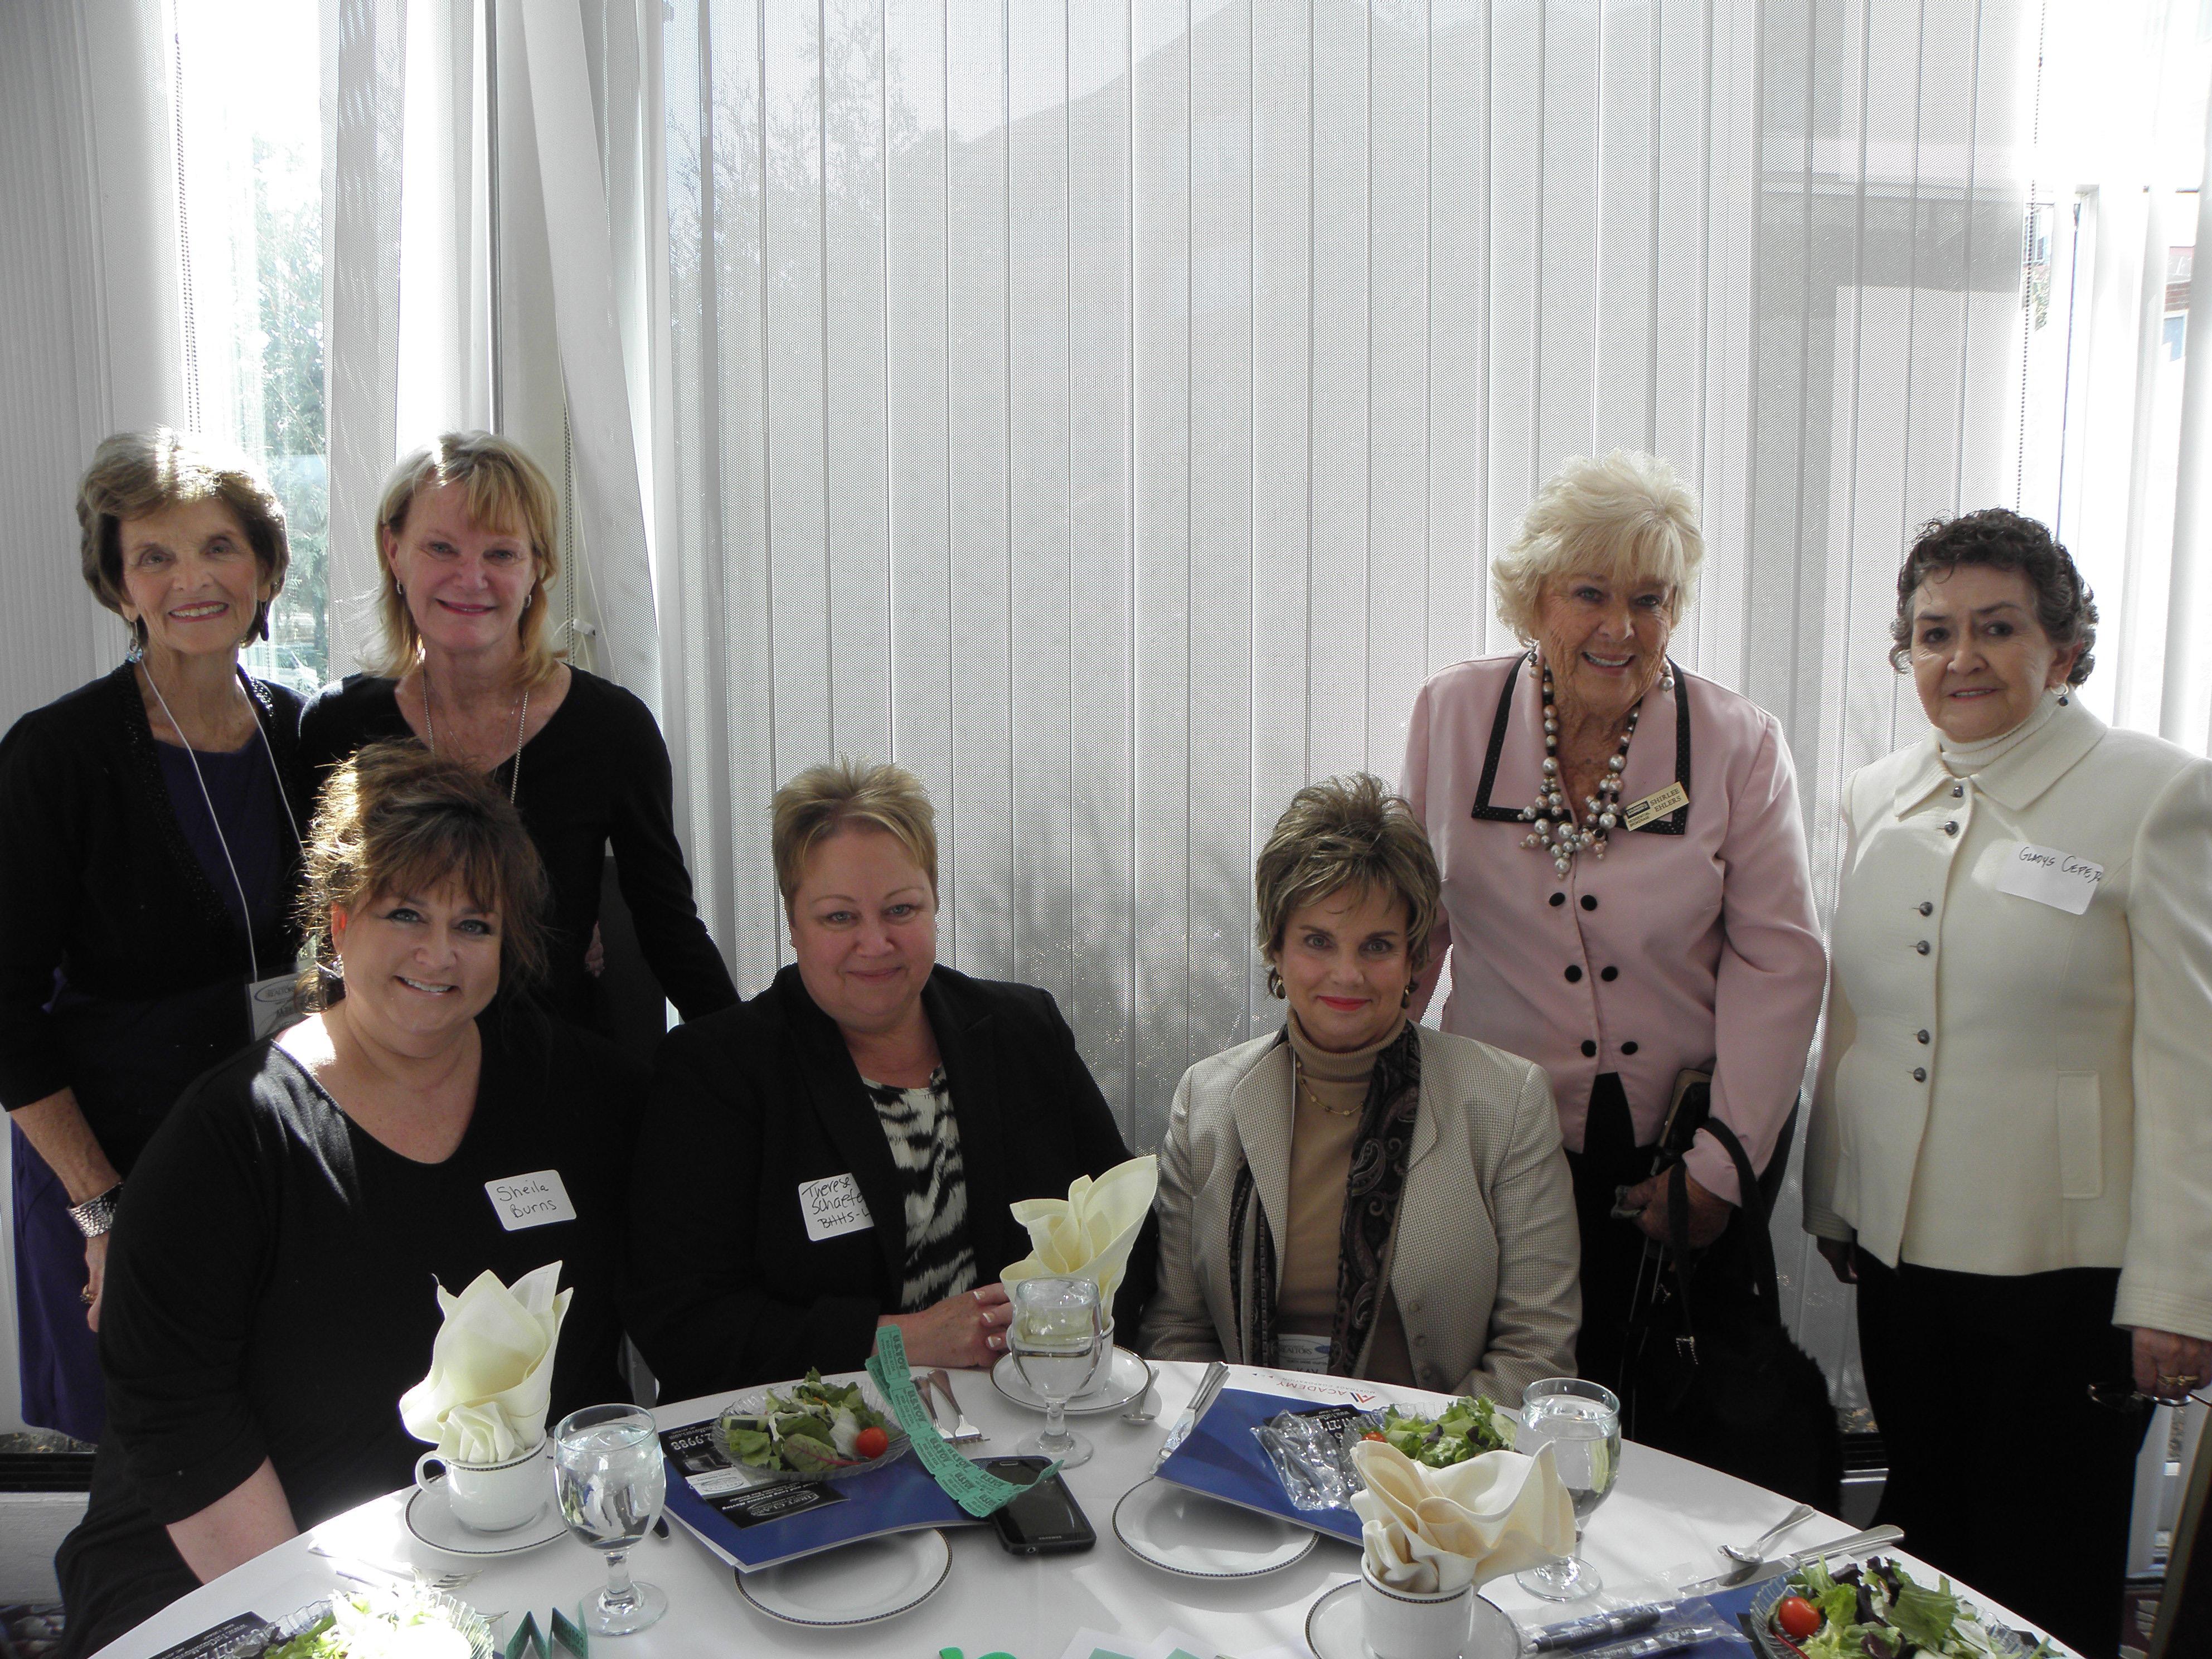 Sheila-Burns-Therese-Schaefer-Kay-Feldman-sitting-Millie-Kepler-Linda-Popp-Shirlee-Ehlers-Gladyse-Cepeda.jpg